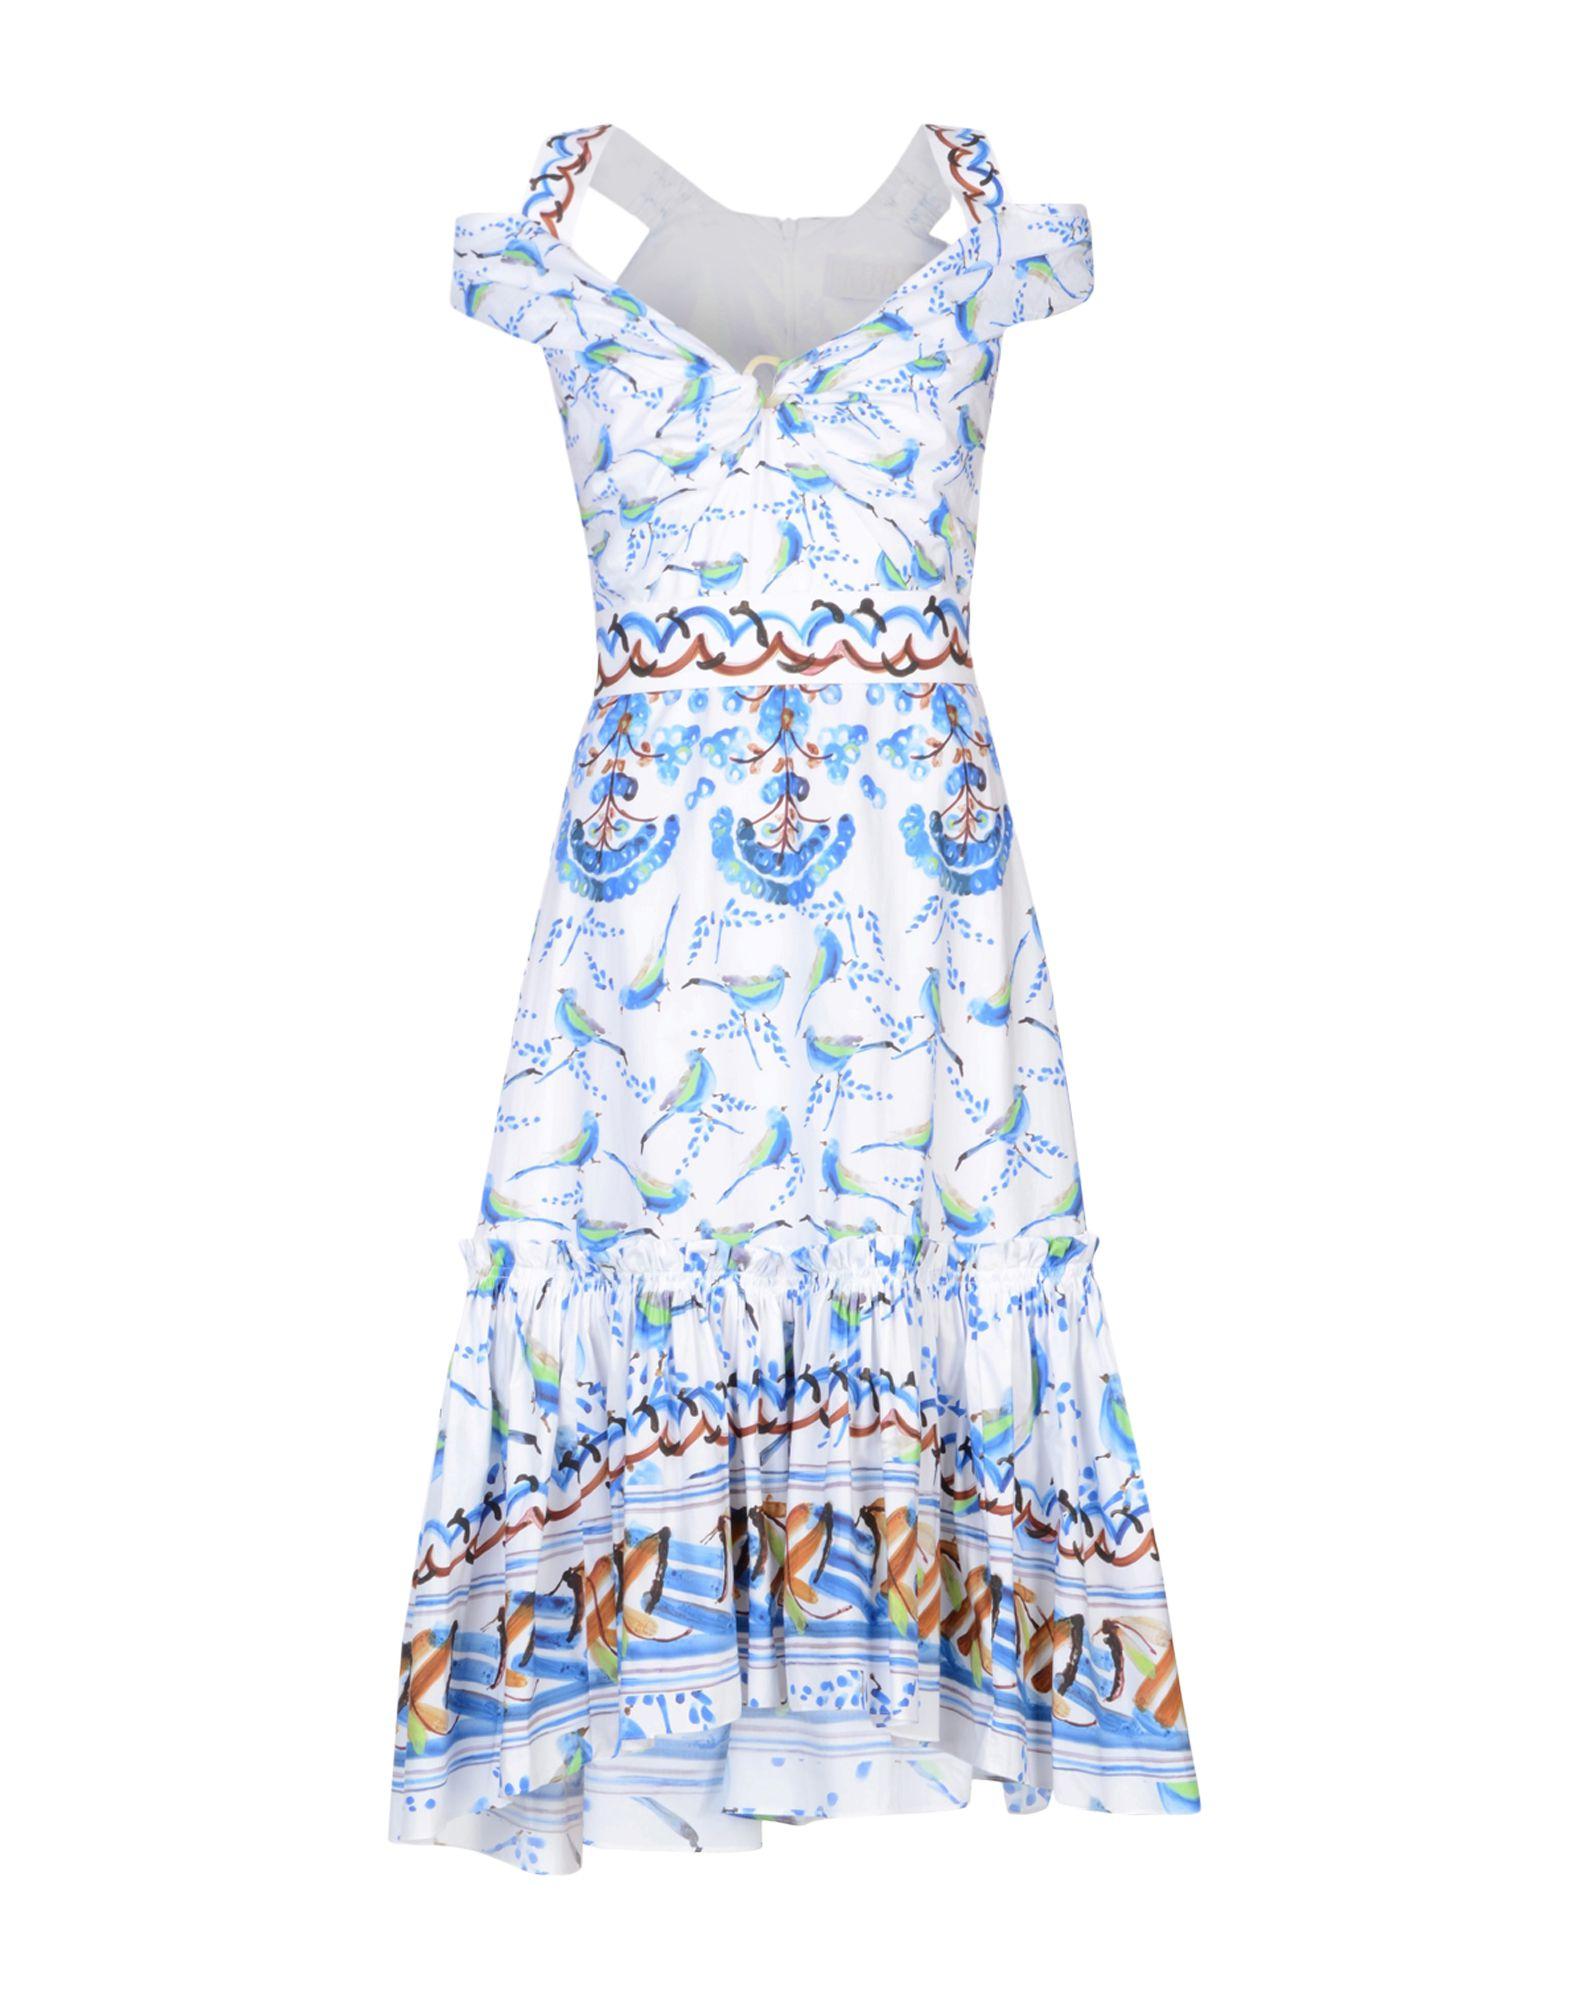 PETER PILOTTO Платье длиной 3/4 nardi pvl 4 lt 33 x